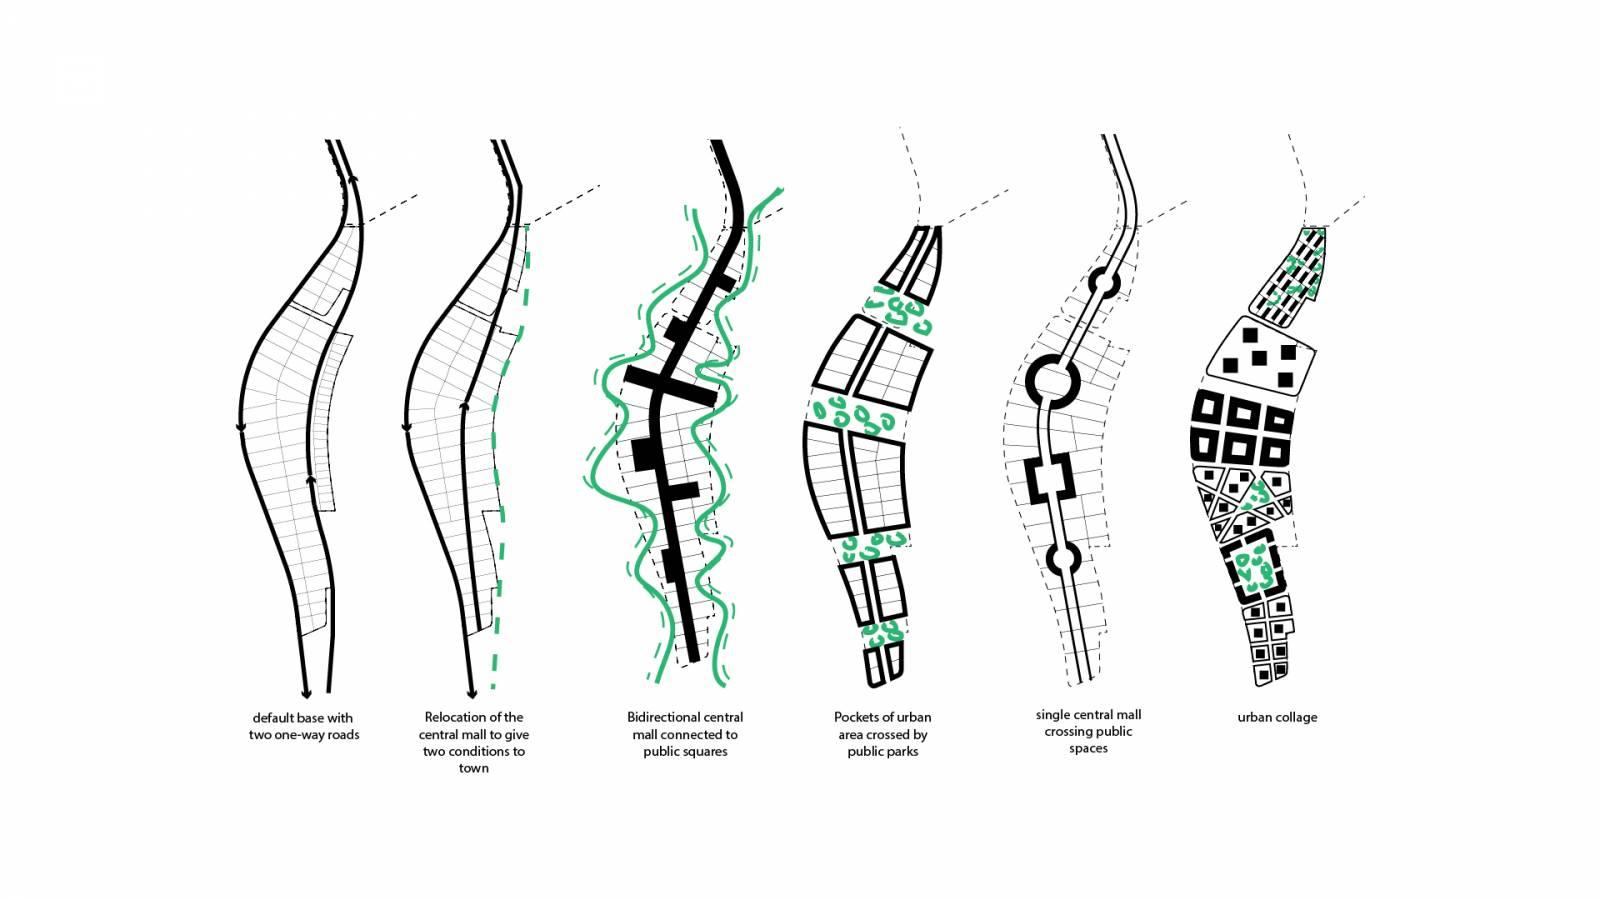 CONCEPT EVOLUTION DIAGRAM - Alphaville Ceará - SPOL Architects